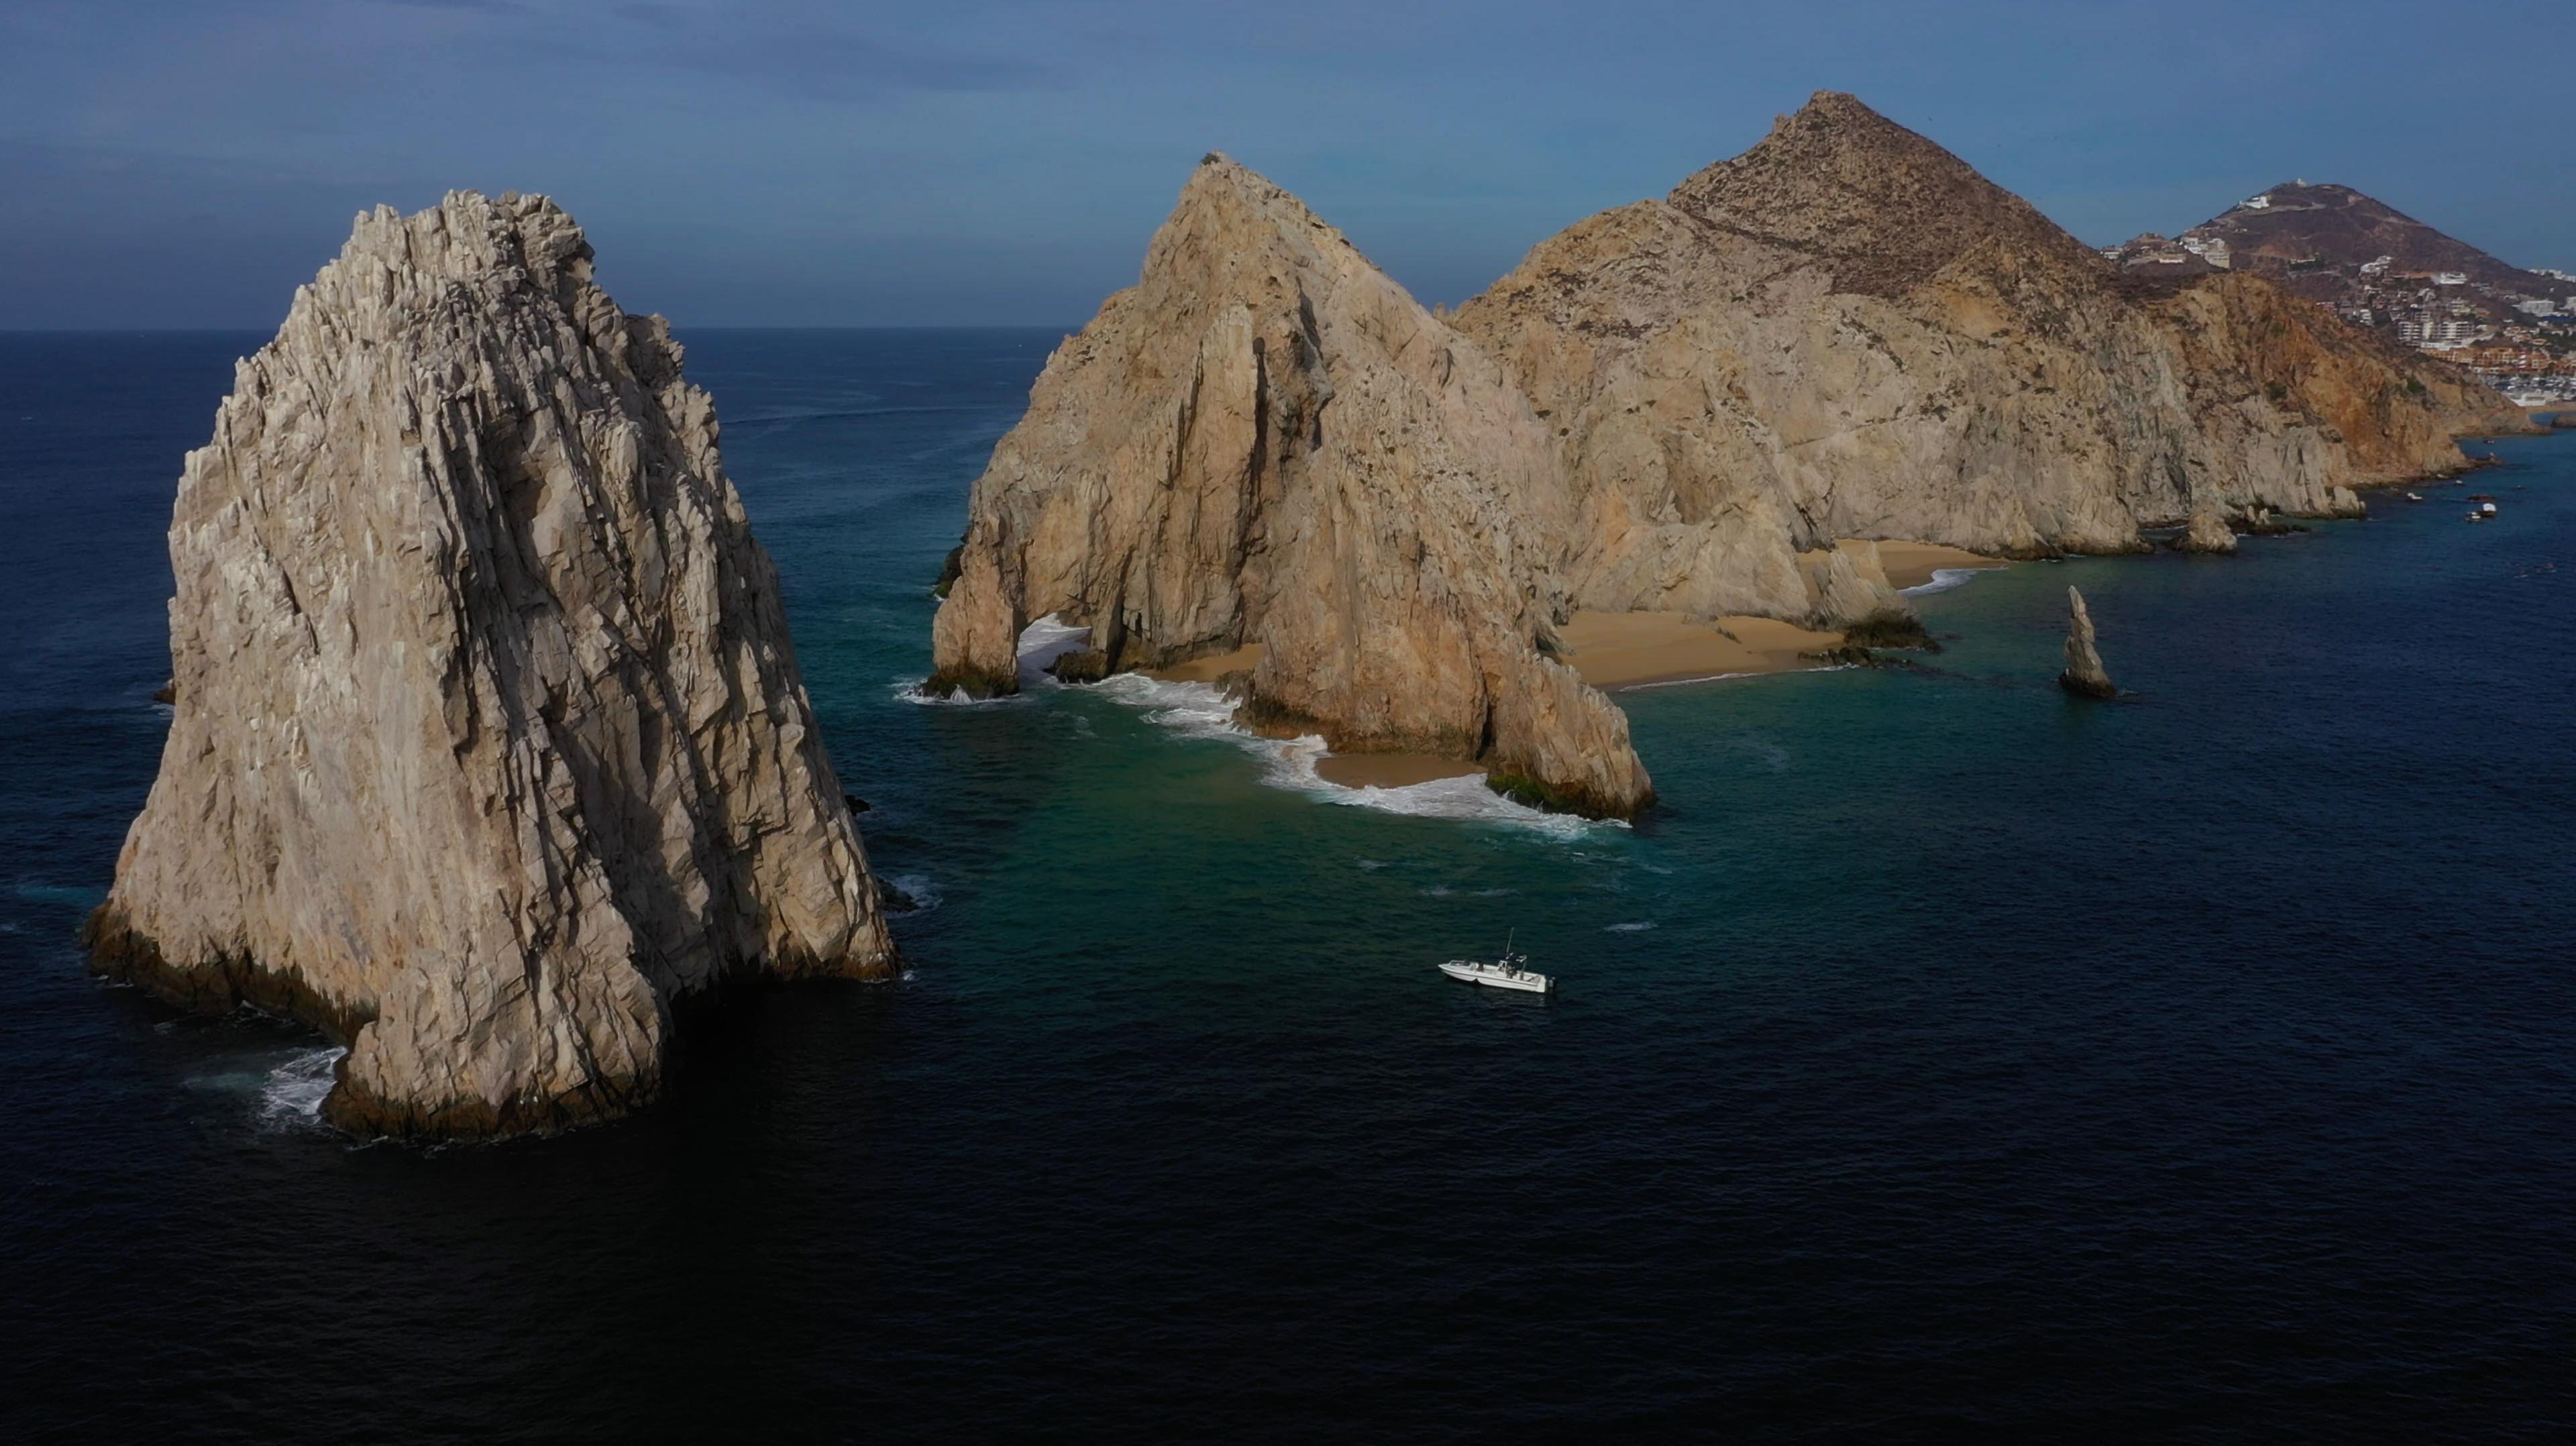 pelagic safari boat in front of Cabo san Lucas clifs